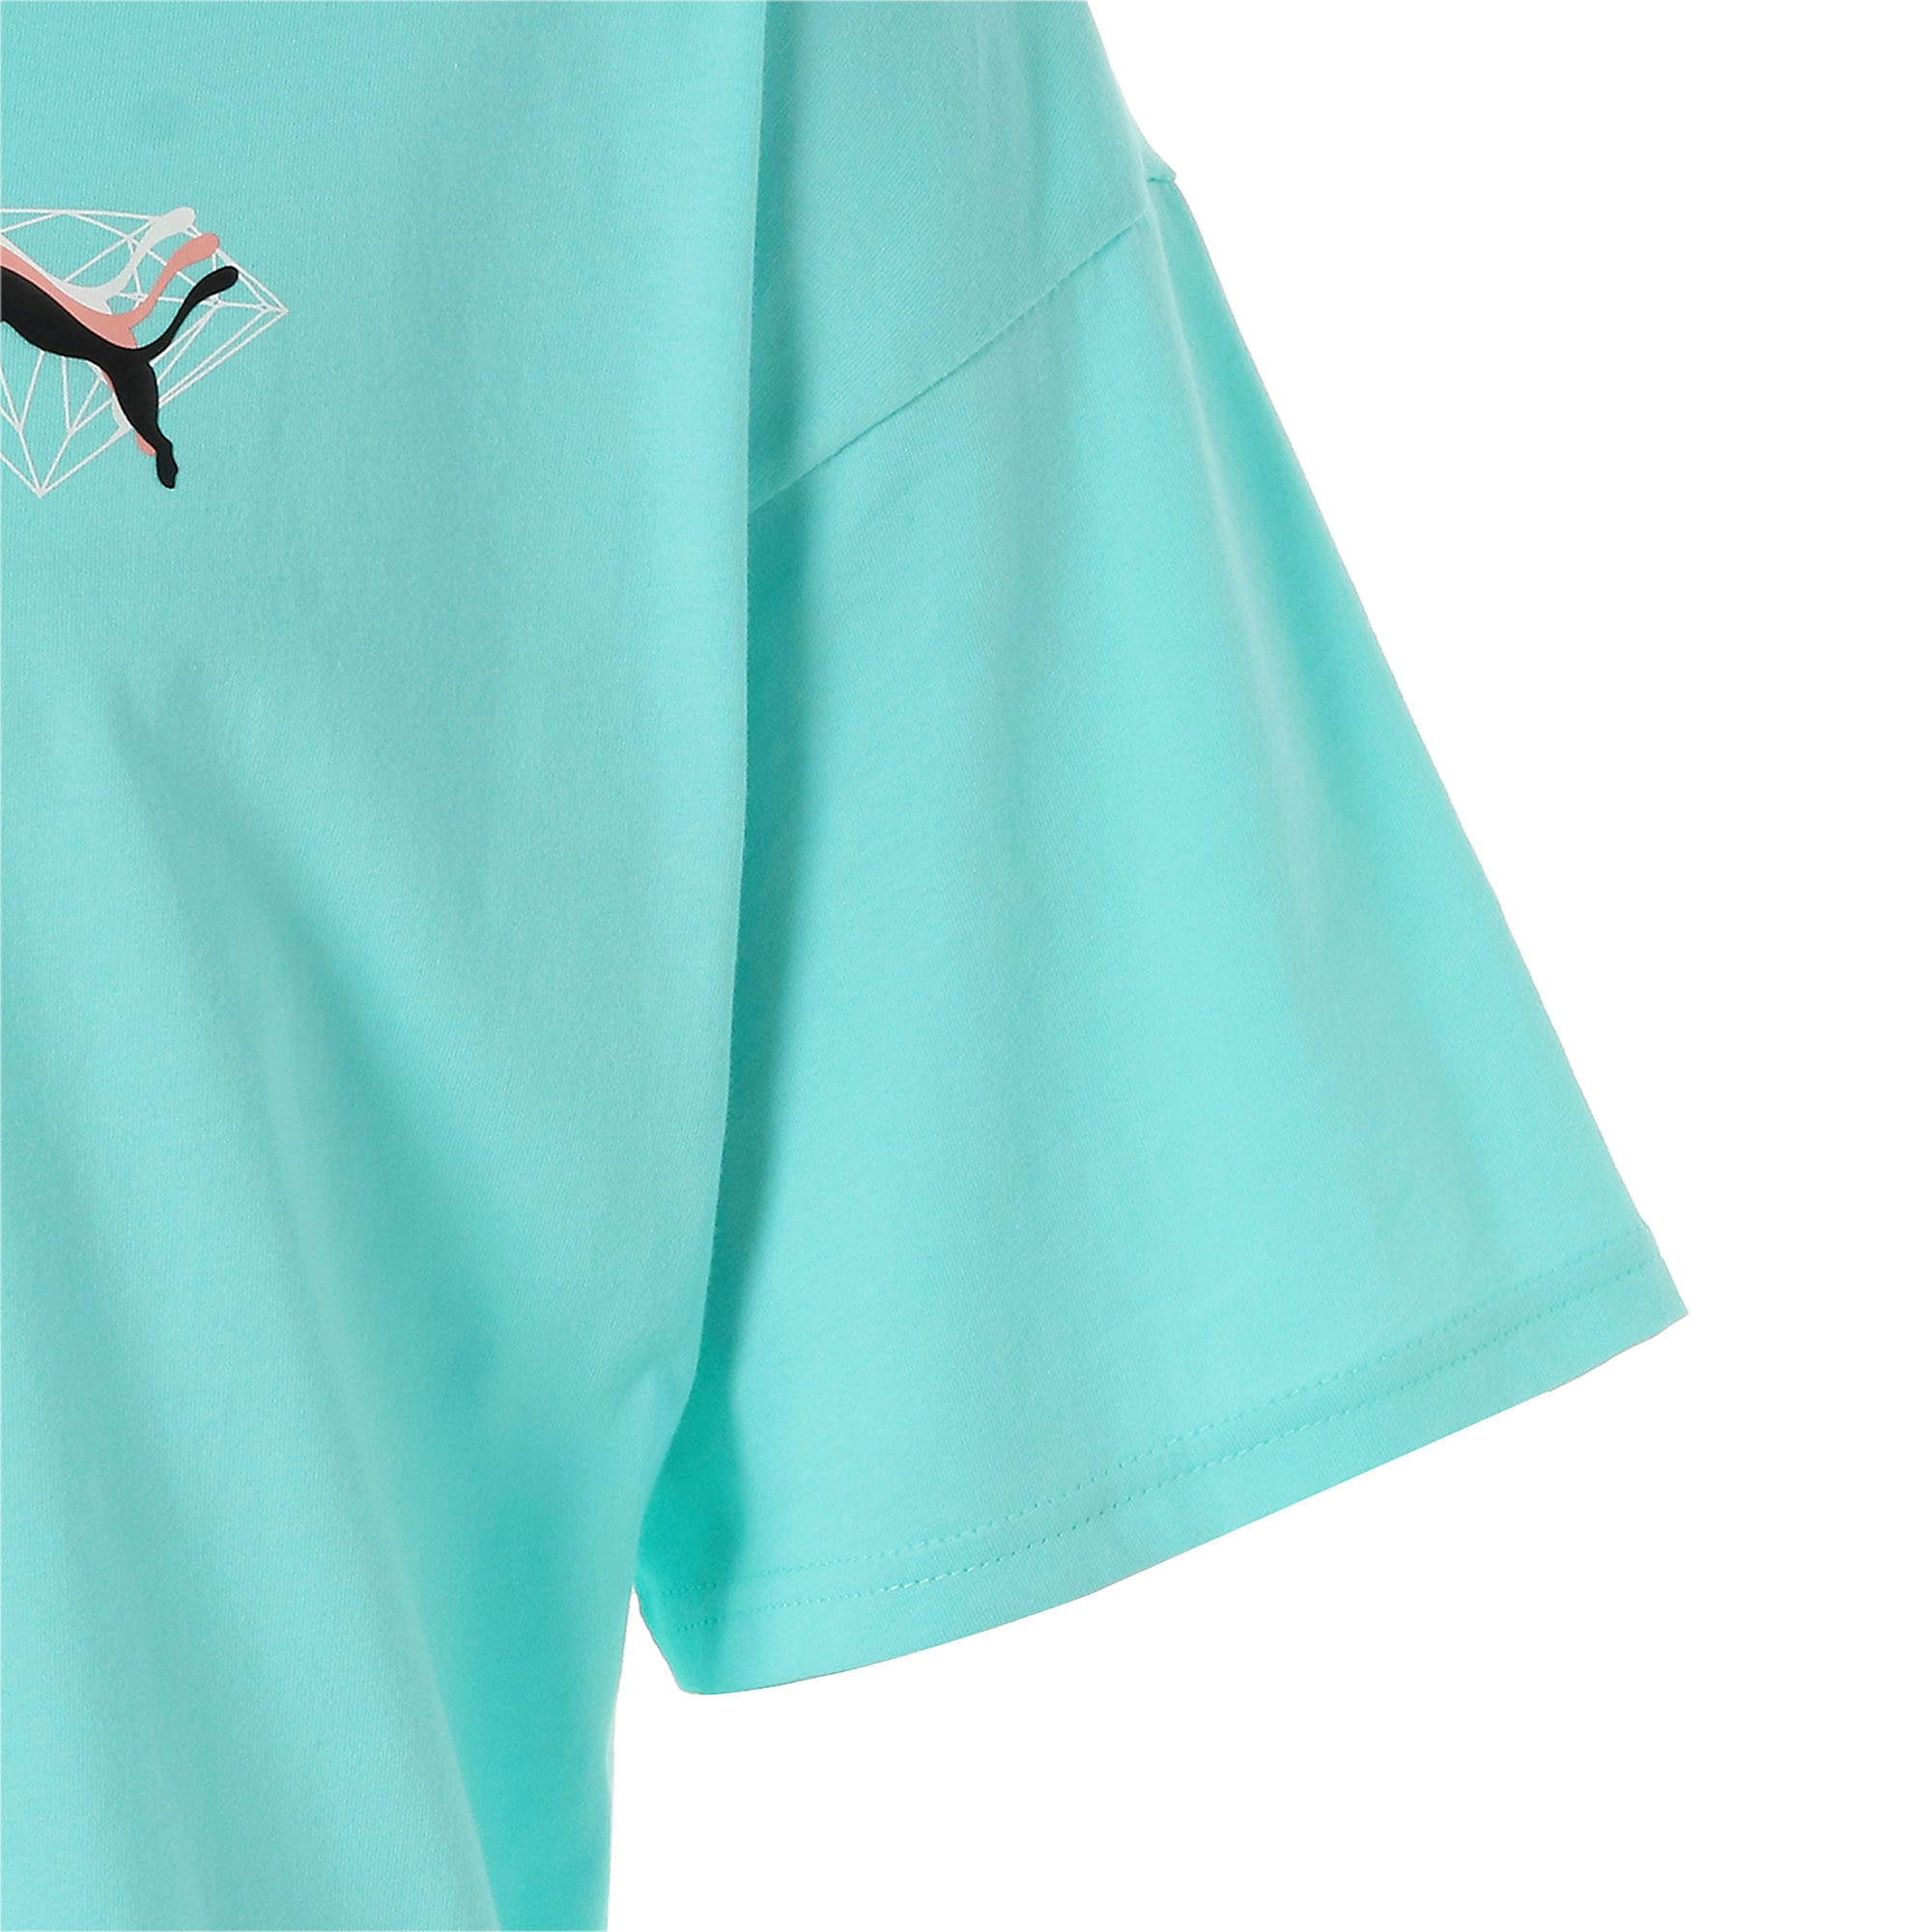 Thumbnail 8 of PUMA x DIAMOND Tシャツ, ARUBA BLUE, medium-JPN